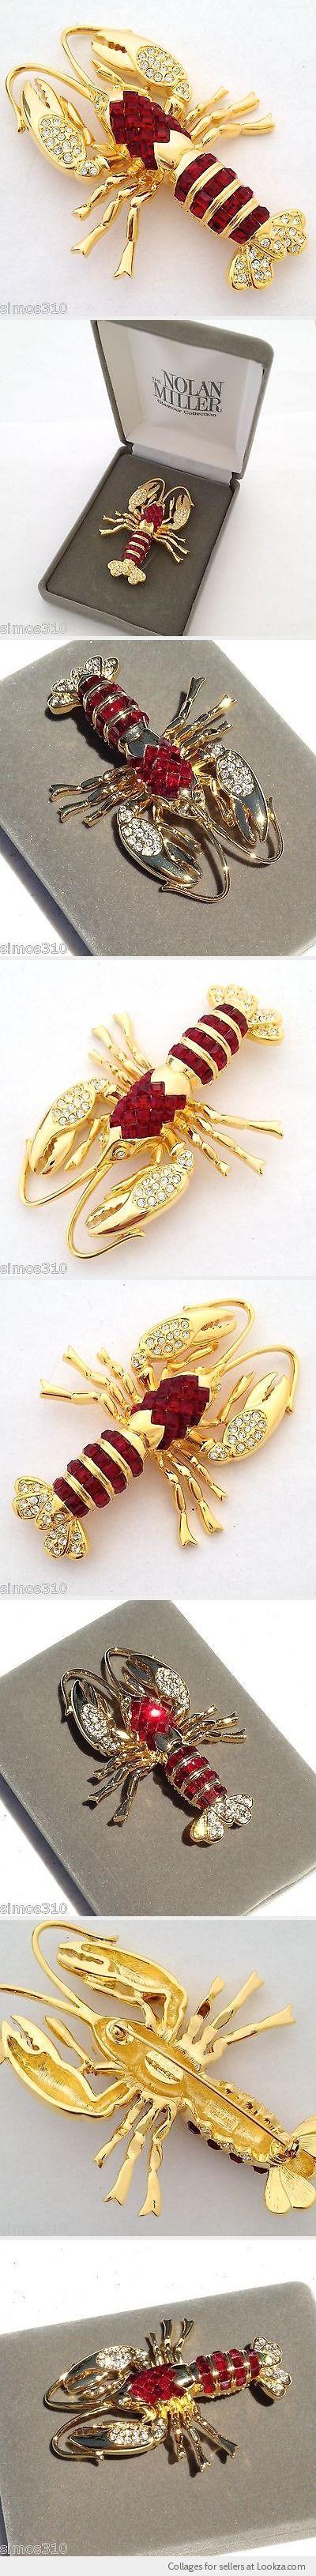 Nolan Miller Bar Harbor Lobster Pin Brooch Simulated Ruby Crystals NIB - Found on Lookza.com